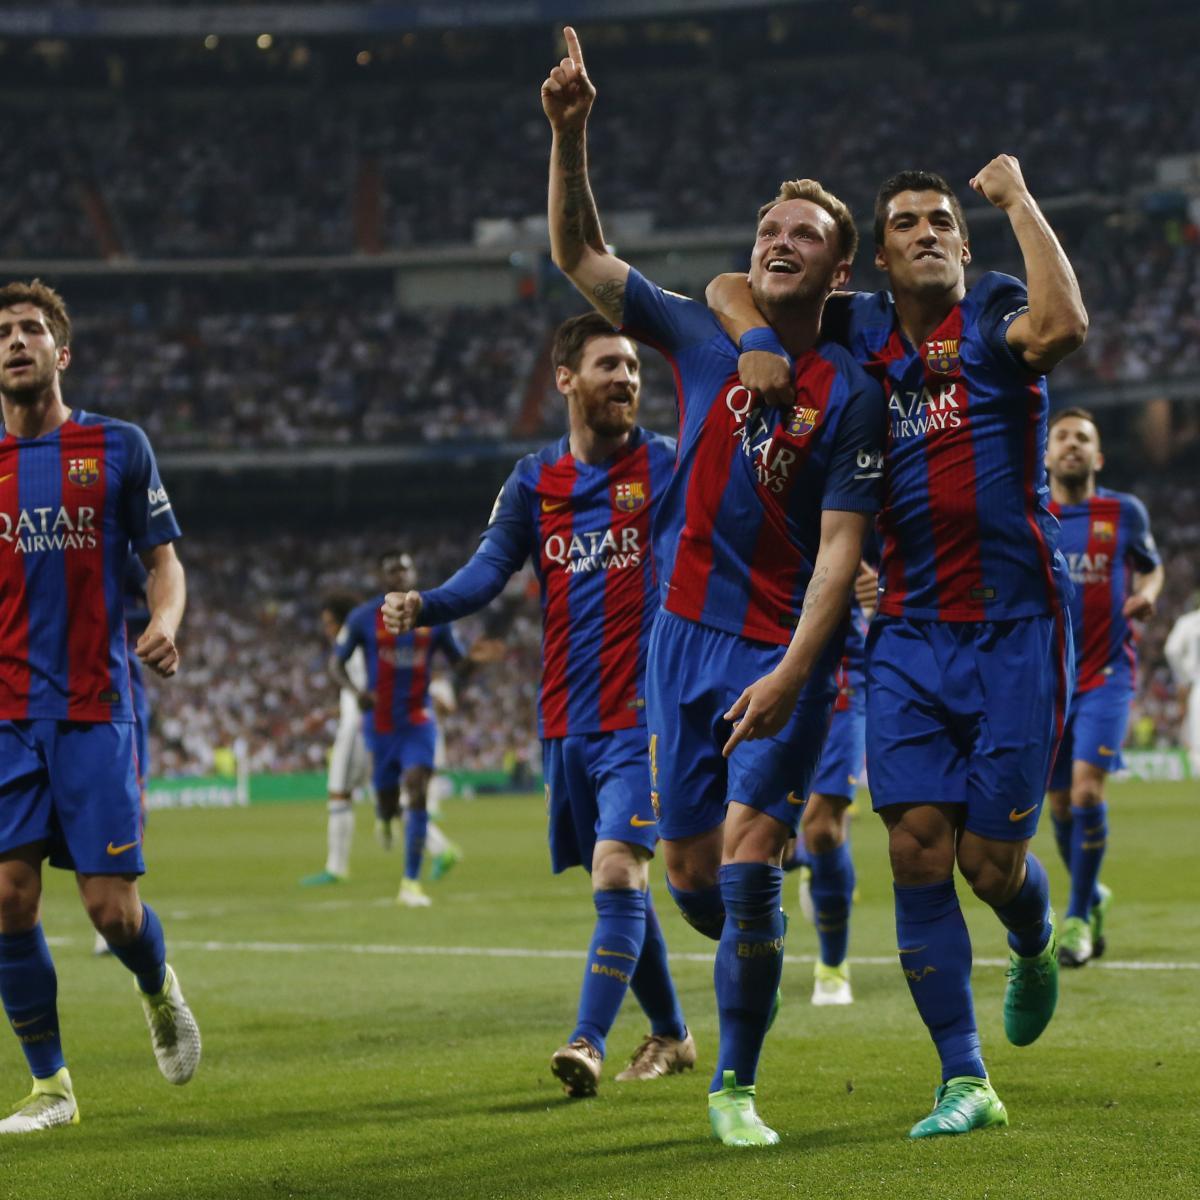 Celta Vigo Vs Barcelona Predictions Today: La Liga Fixtures 2017: Schedule, Live Stream And Week 34